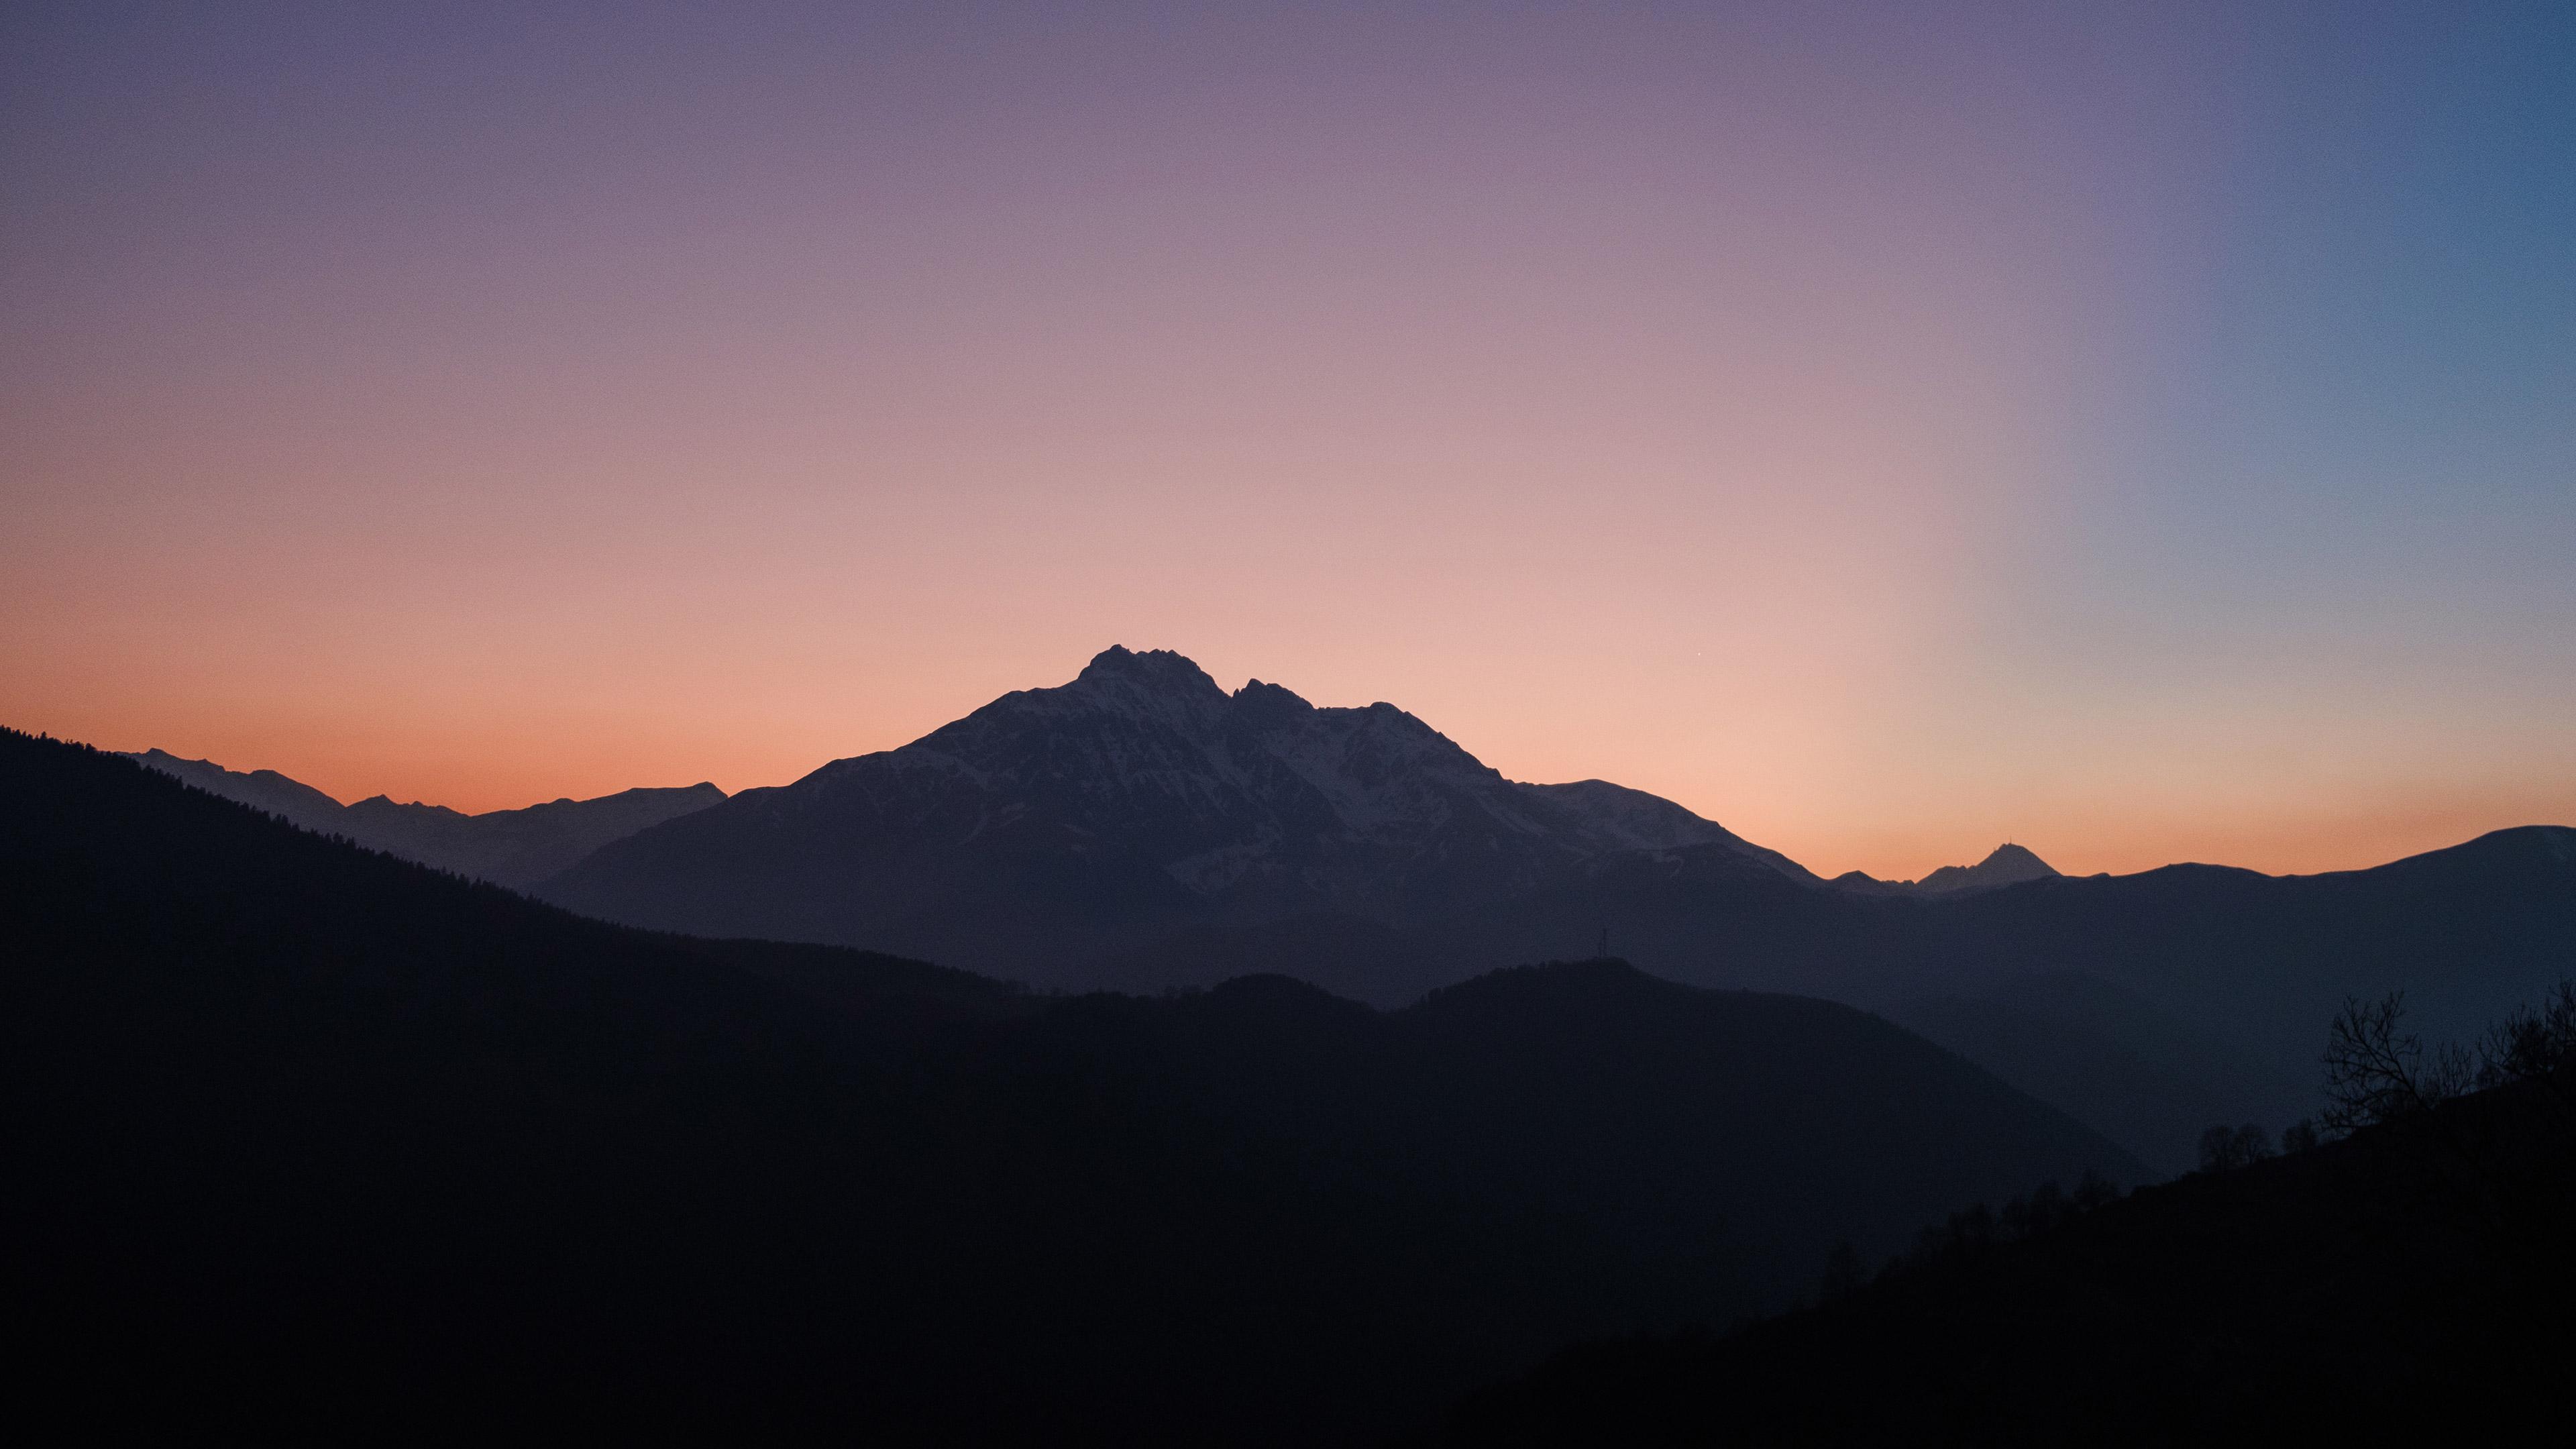 nice sunset over mountains 4k 1540133051 - Nice Sunset Over Mountains 4k - sunset wallpapers, nature wallpapers, mountains wallpapers, hd-wallpapers, 4k-wallpapers